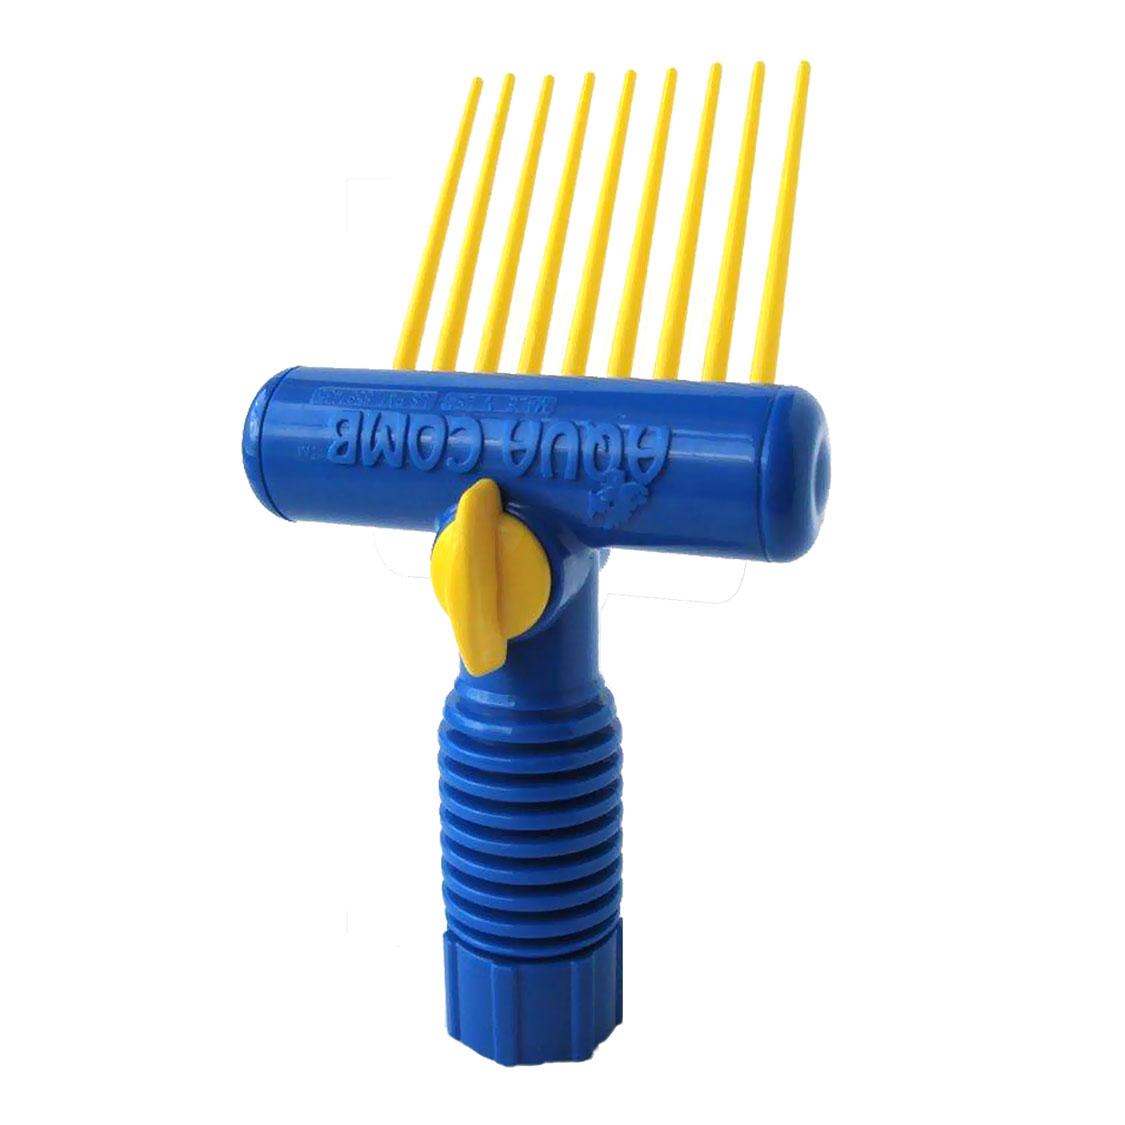 Cartridge Cleaner, Pool Aqua Comb, Blue, Pool Filter